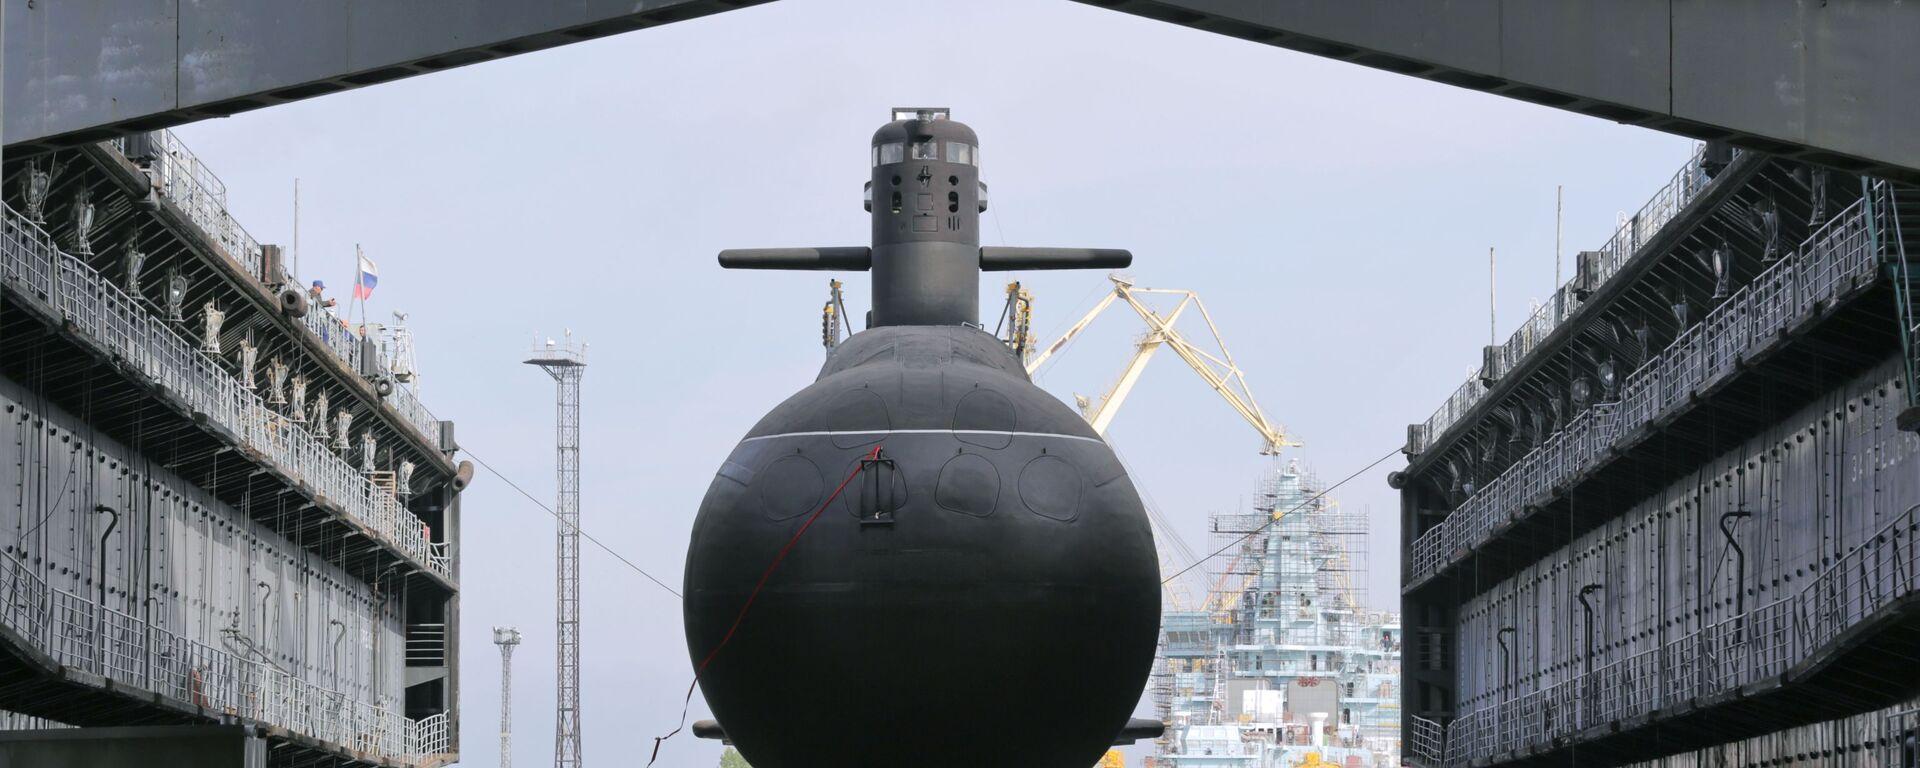 Спуск на воду подводной лодки Кронштадт проекта 677 Лада. - Sputnik Грузия, 1920, 25.02.2021